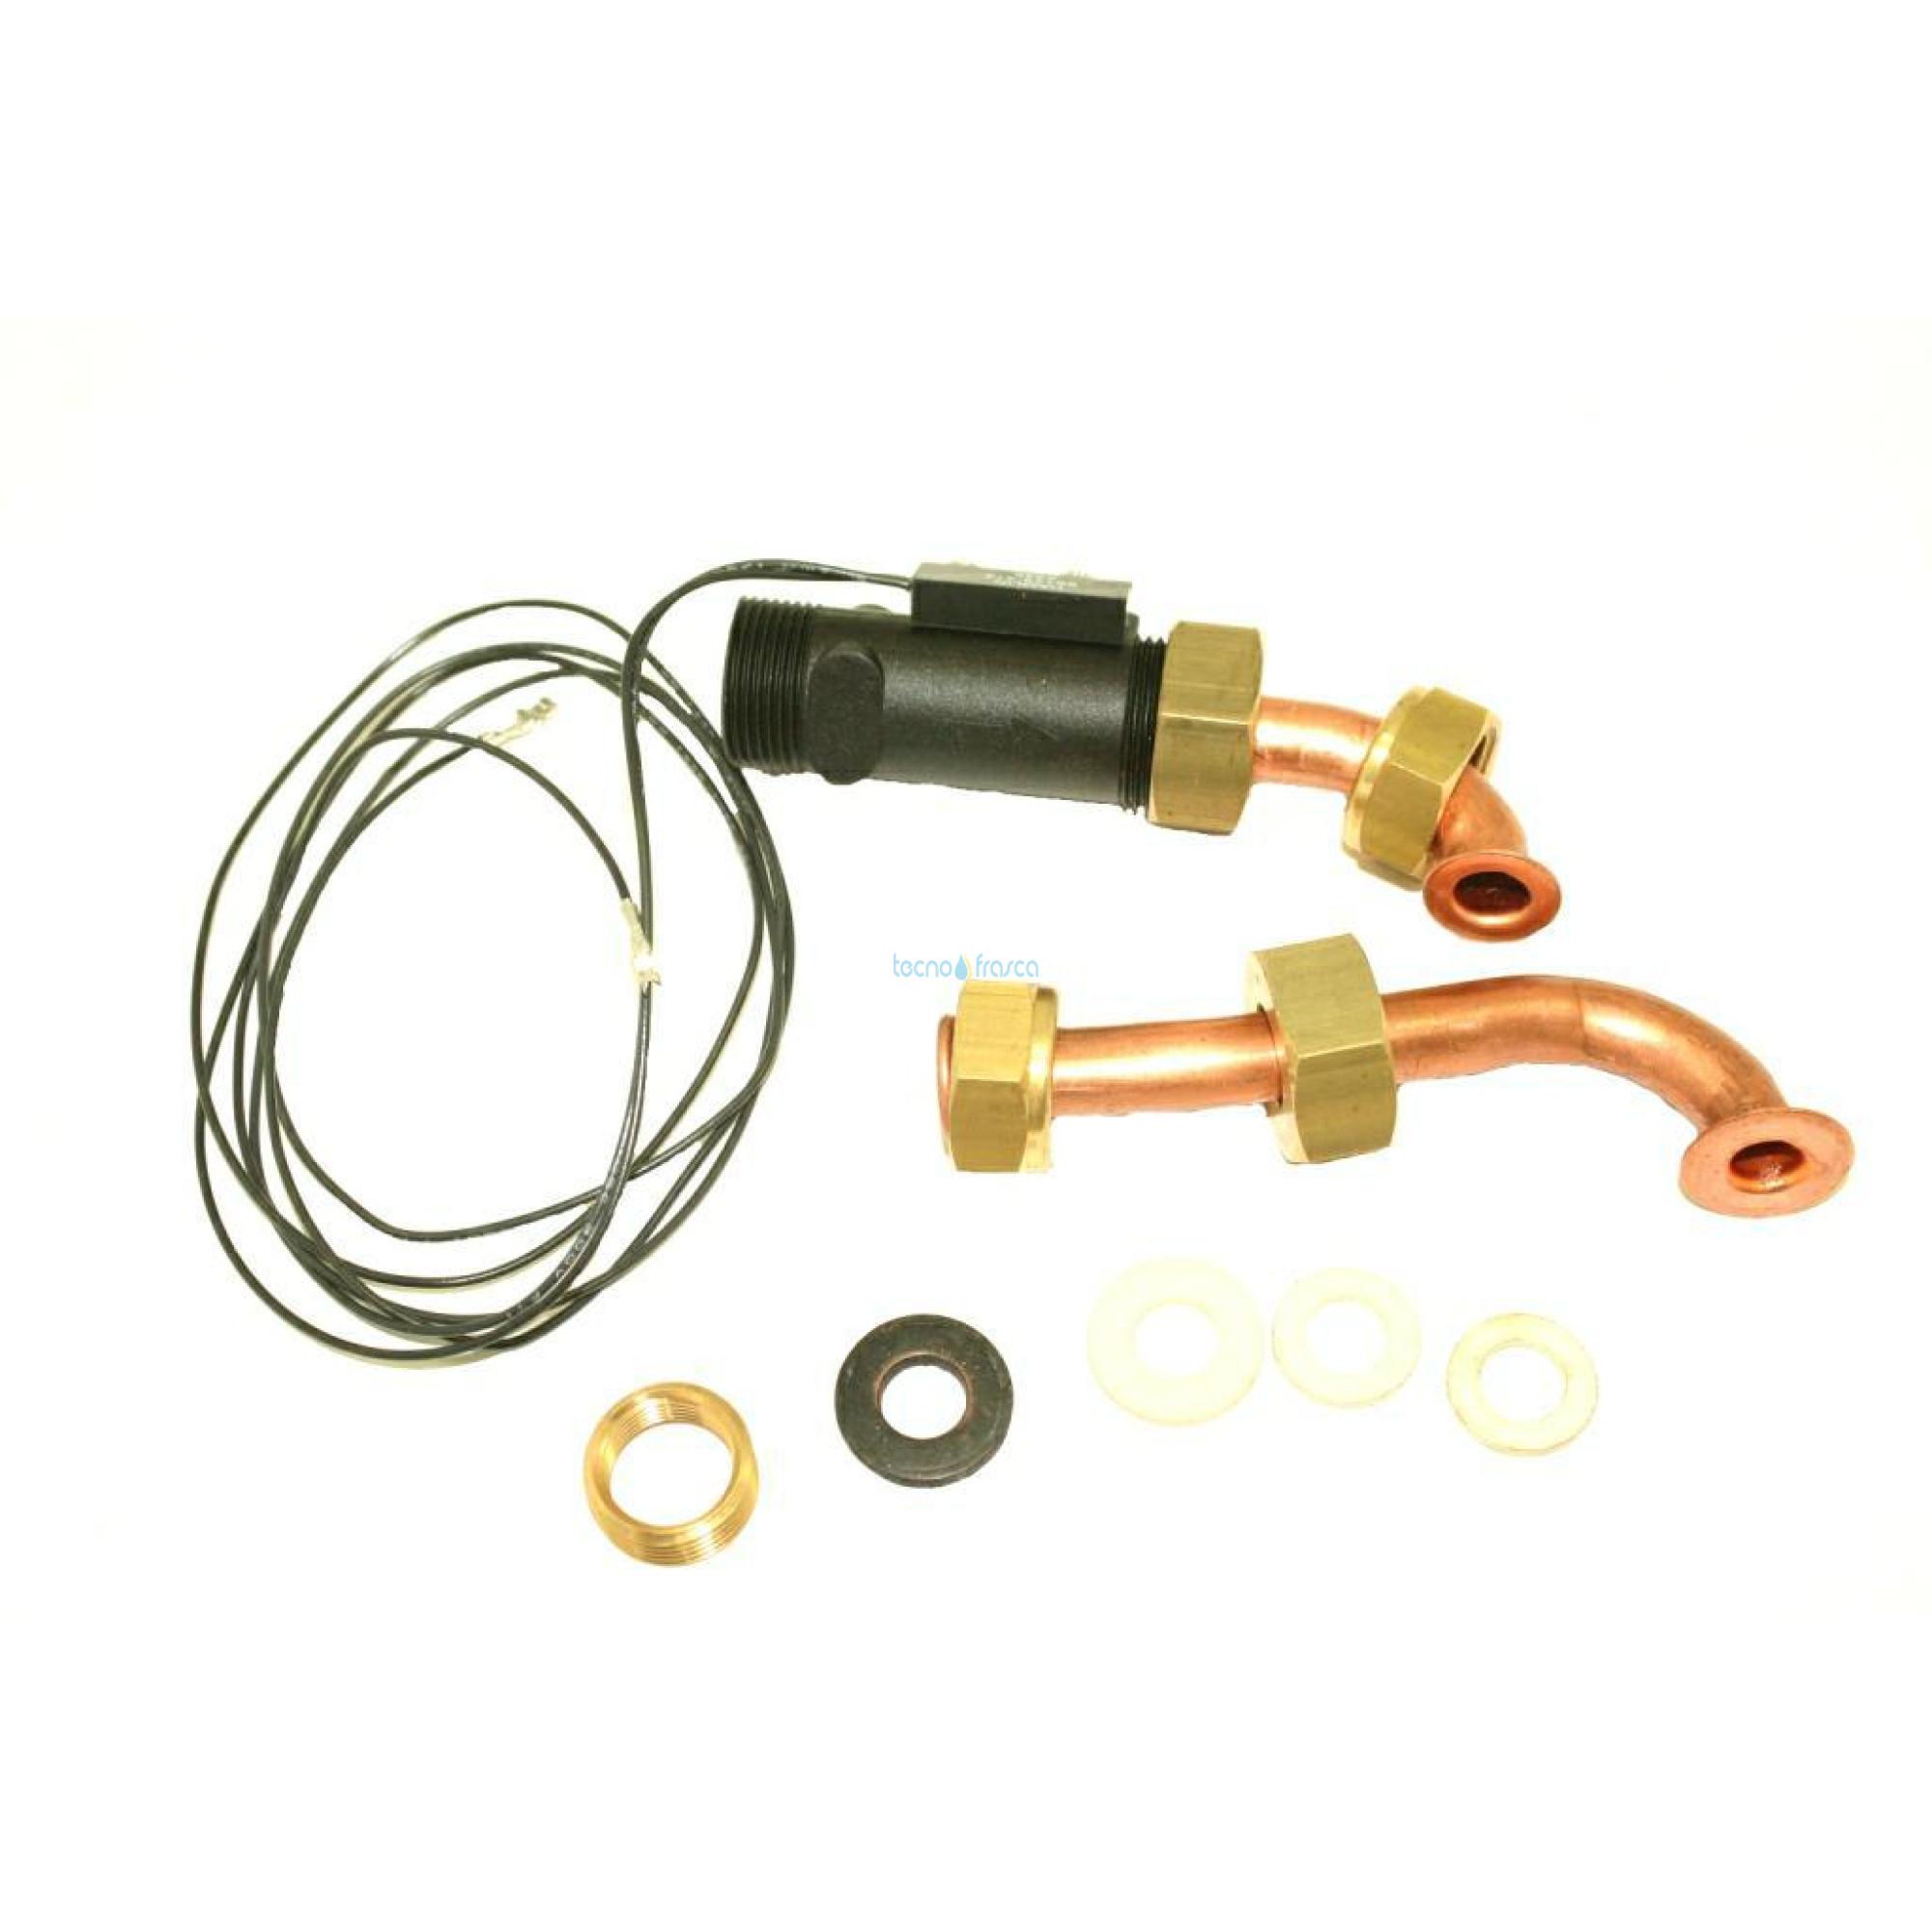 Radiant kit sostituzione flussotato zytel completo di tubi 96008lp